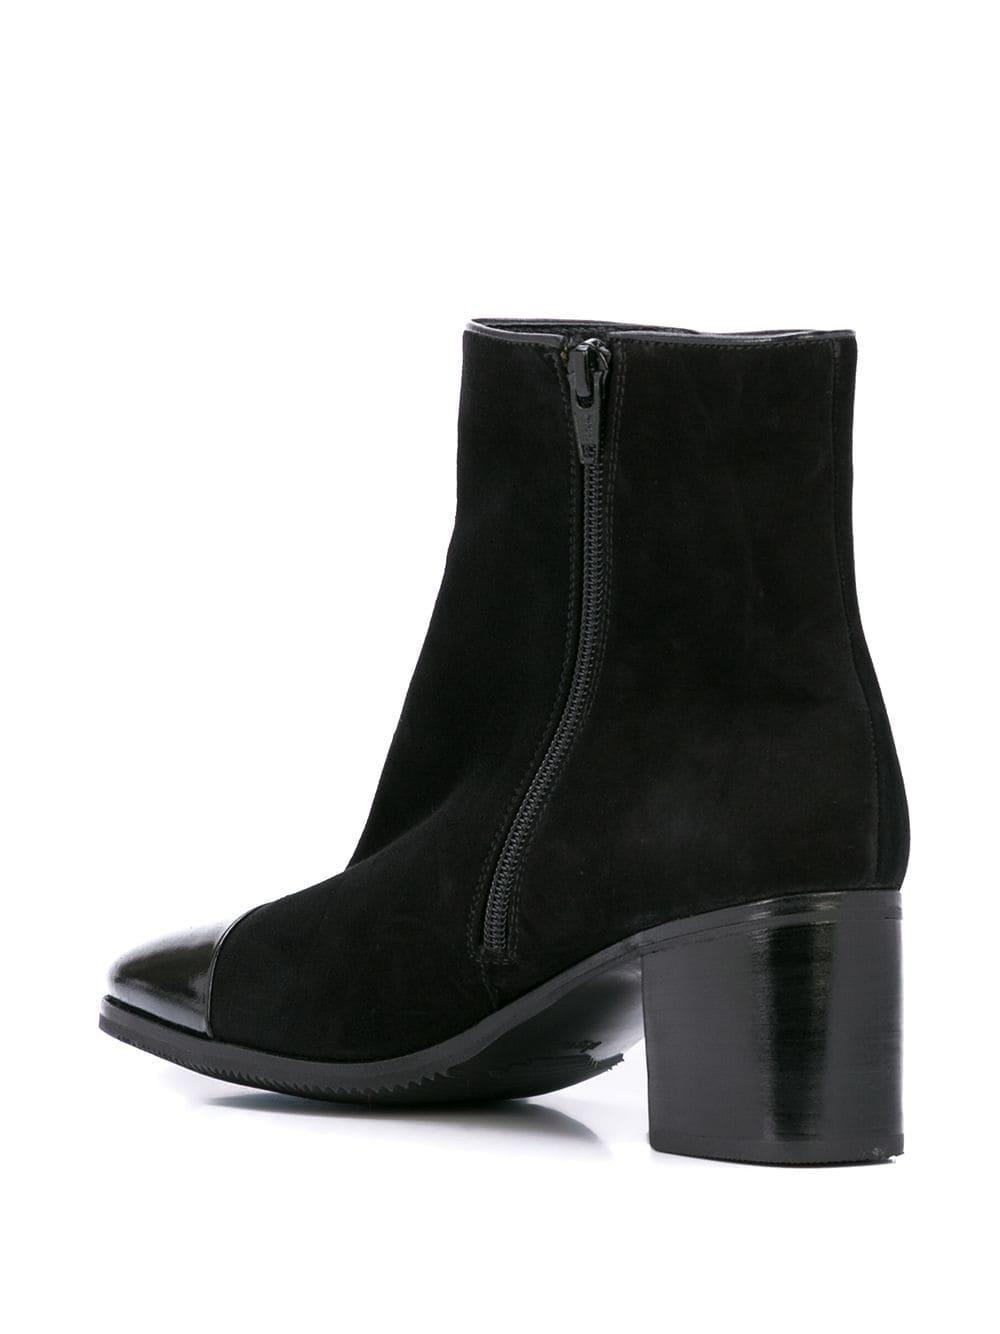 Botines con cremallera Gravati de Cuero de color Negro